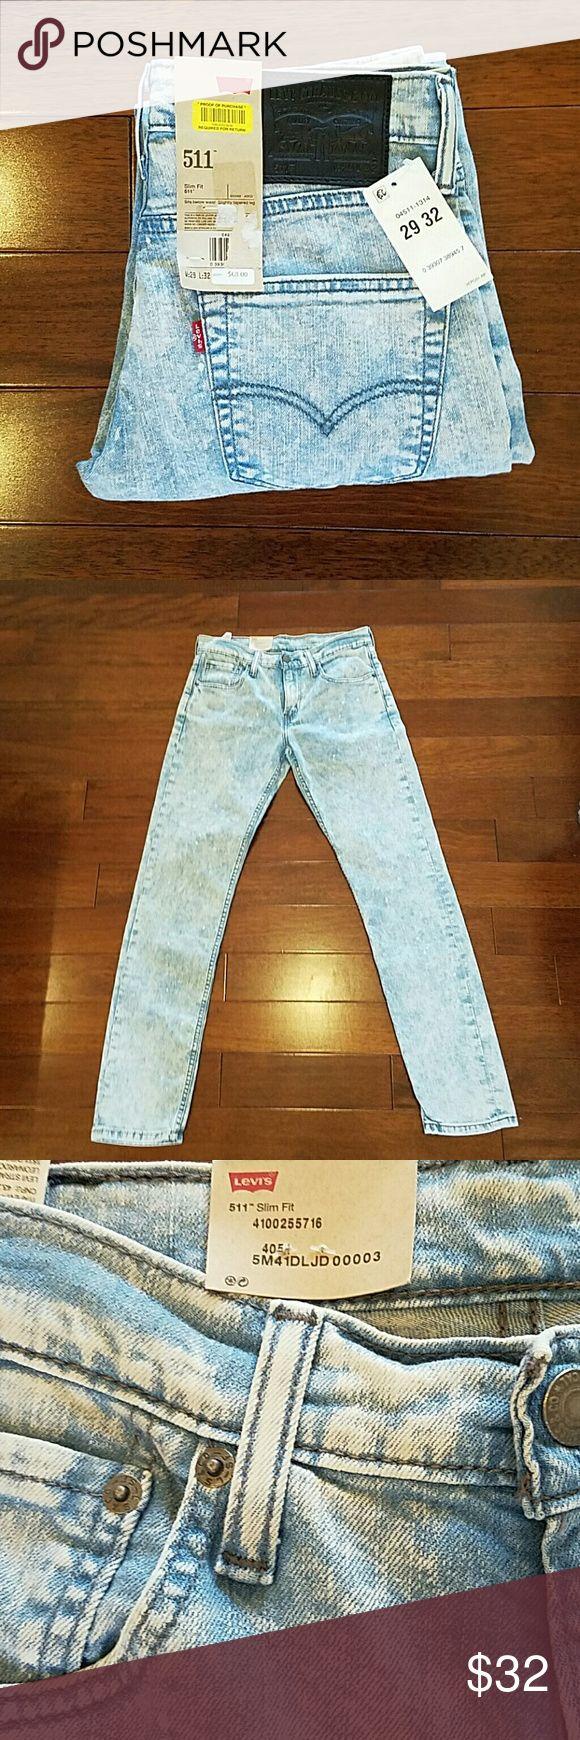 Men's Levi's Jeans 29x32 BRAND NEW WITH TAGS. Men's Levi's Jeans 29x32, slim fit, light blue color, with white speckles on the light blue jeans. 511 jeans. Levi's Jeans Slim